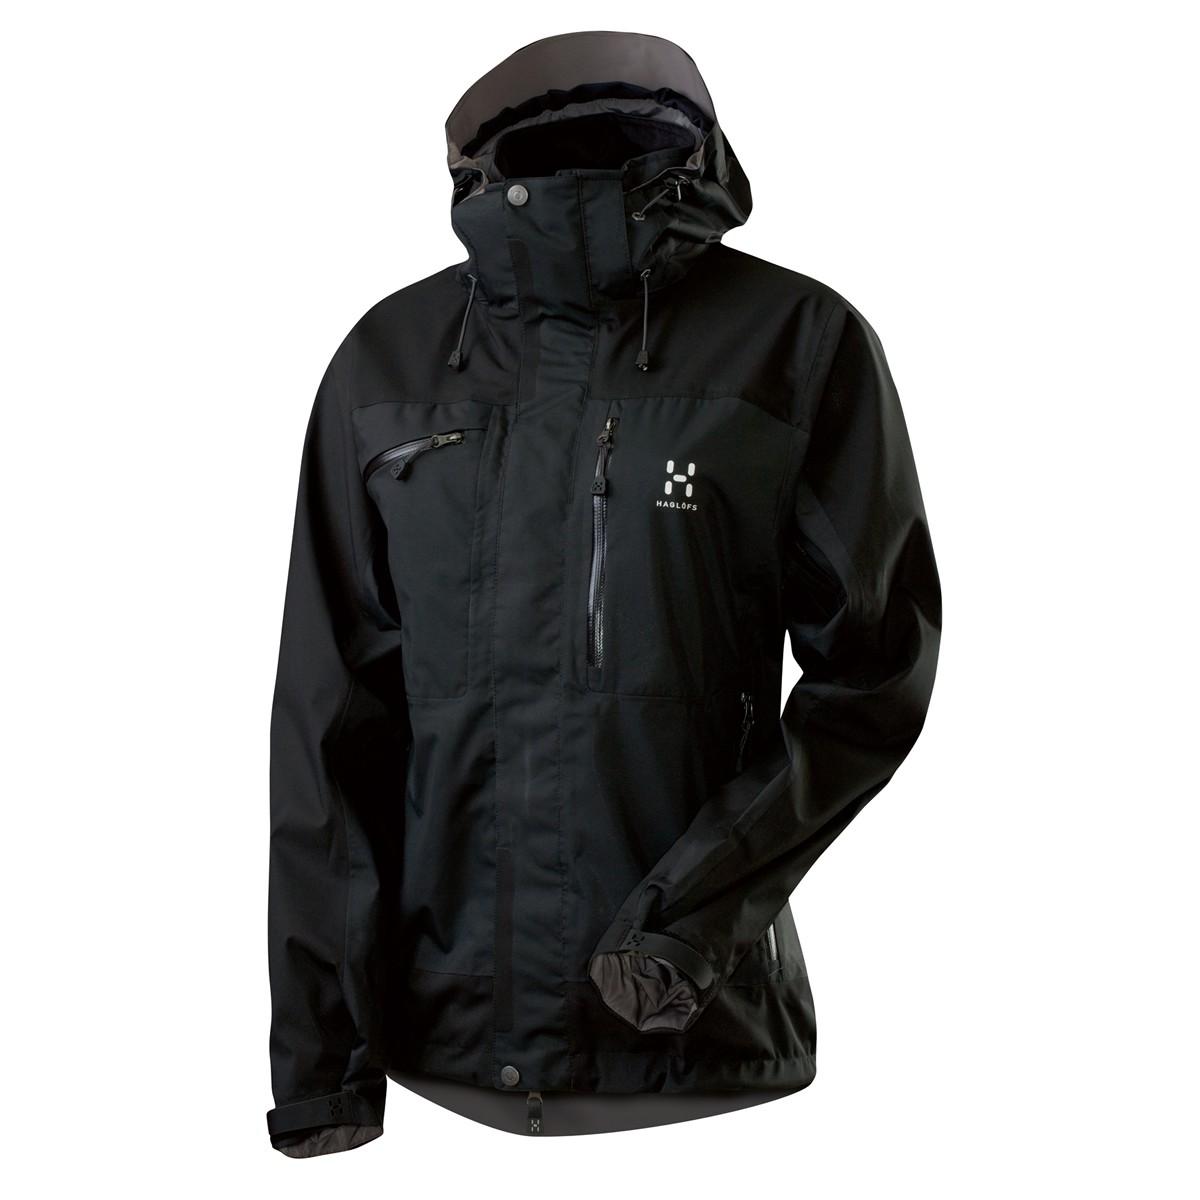 Haglofs P2 Incus Q jacket (2012)